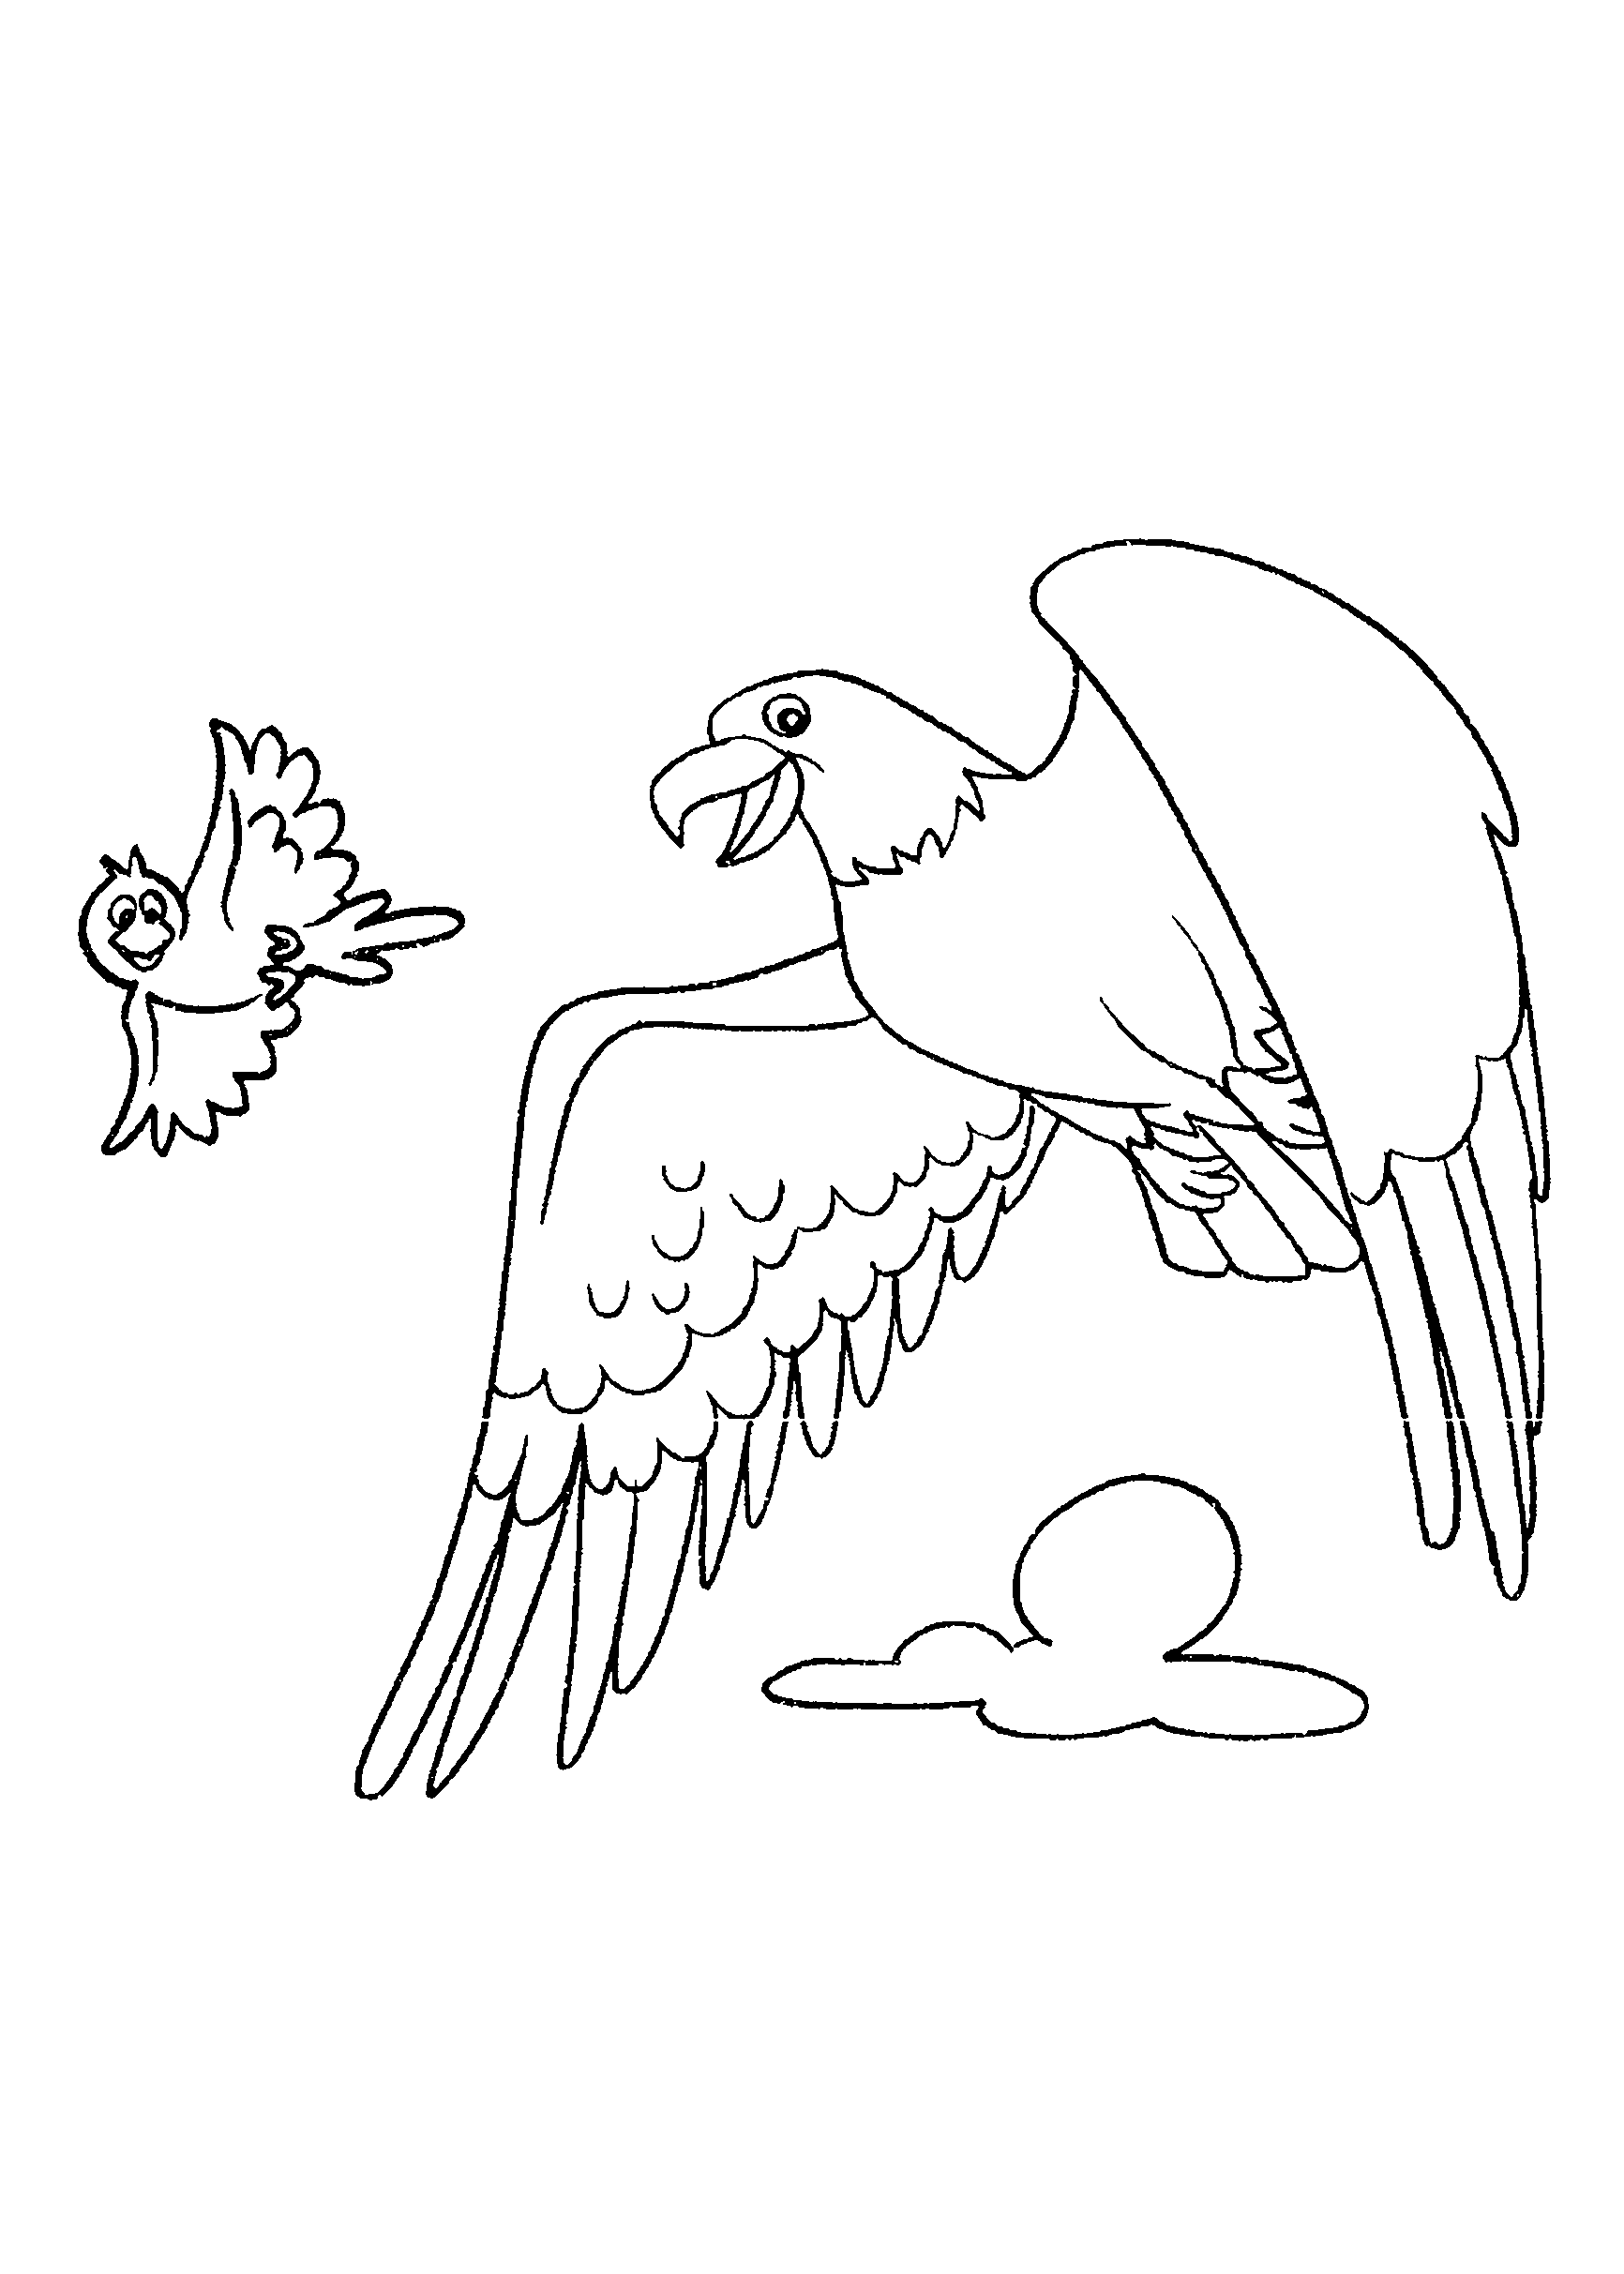 Extremamente Desenhos de Aves para imprimir e colorir - Só Atividades LO55